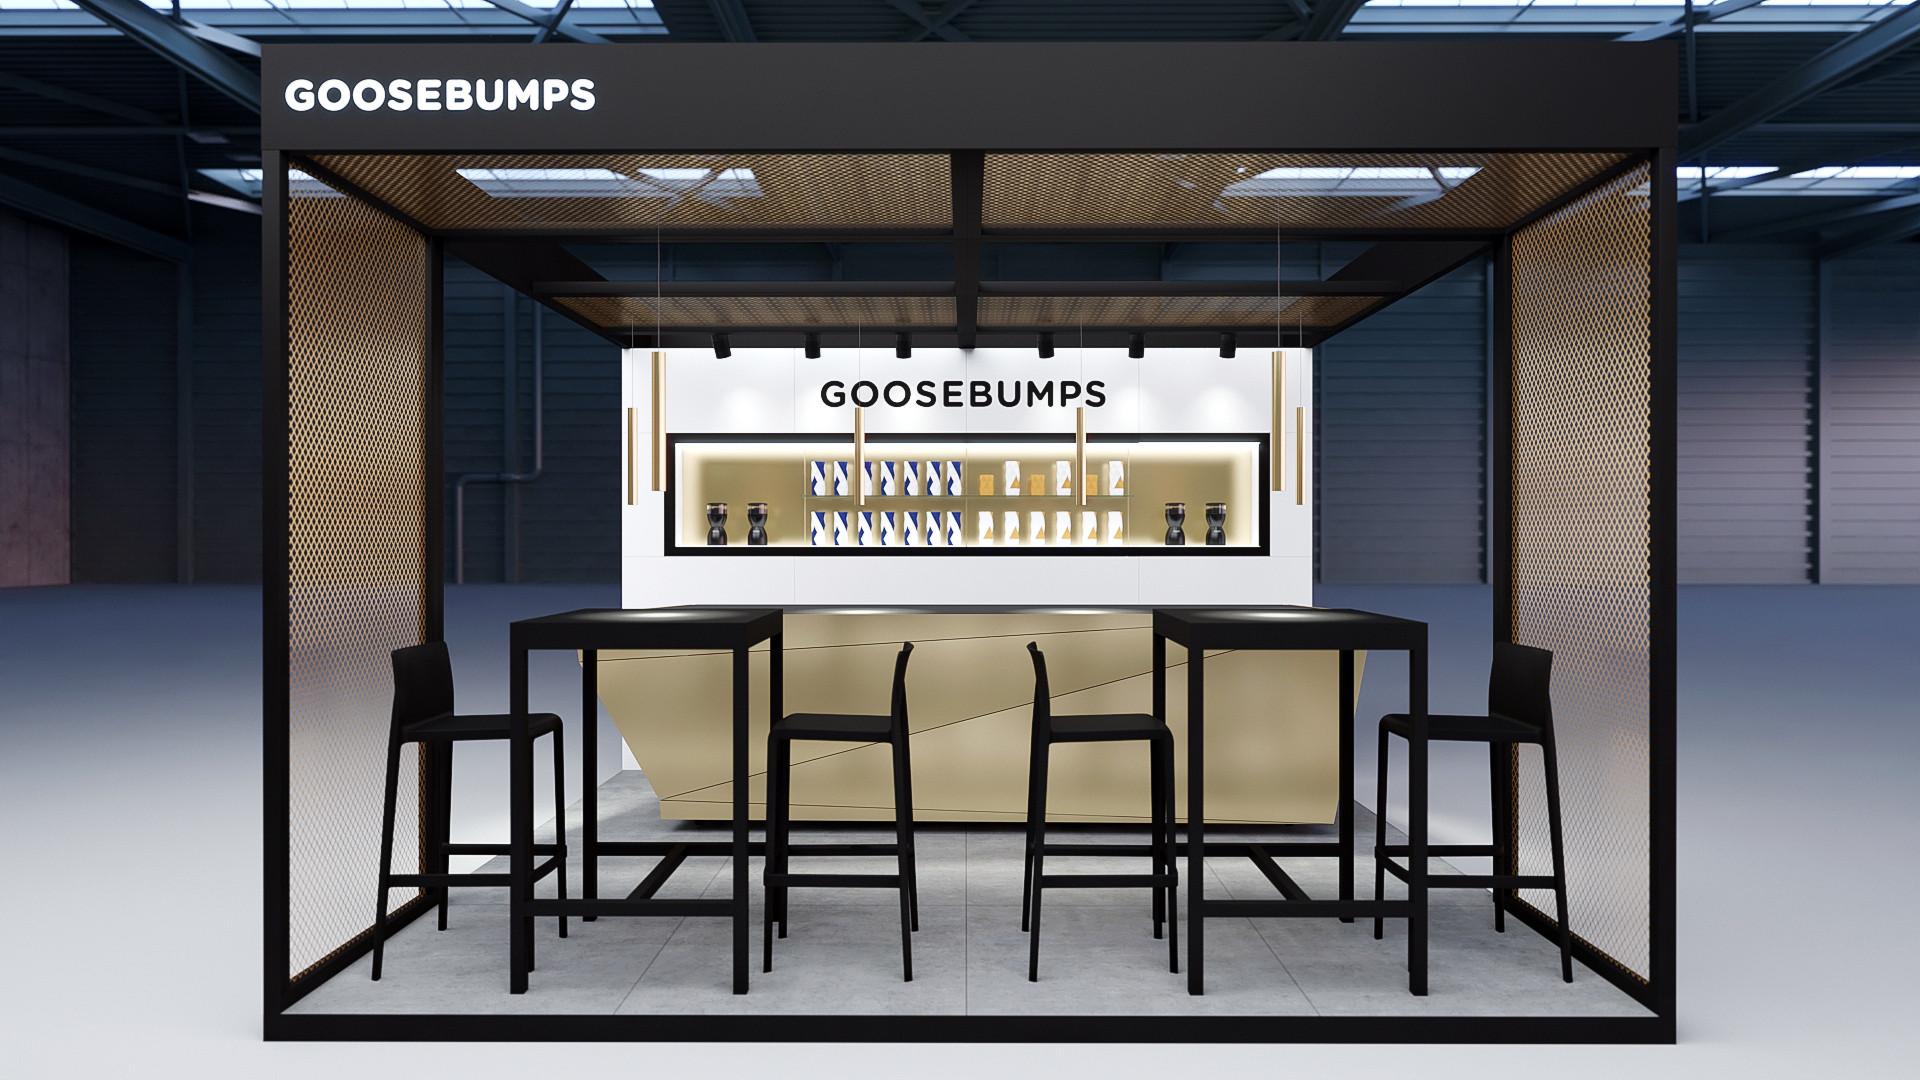 GOOSEBUMPS 4x4